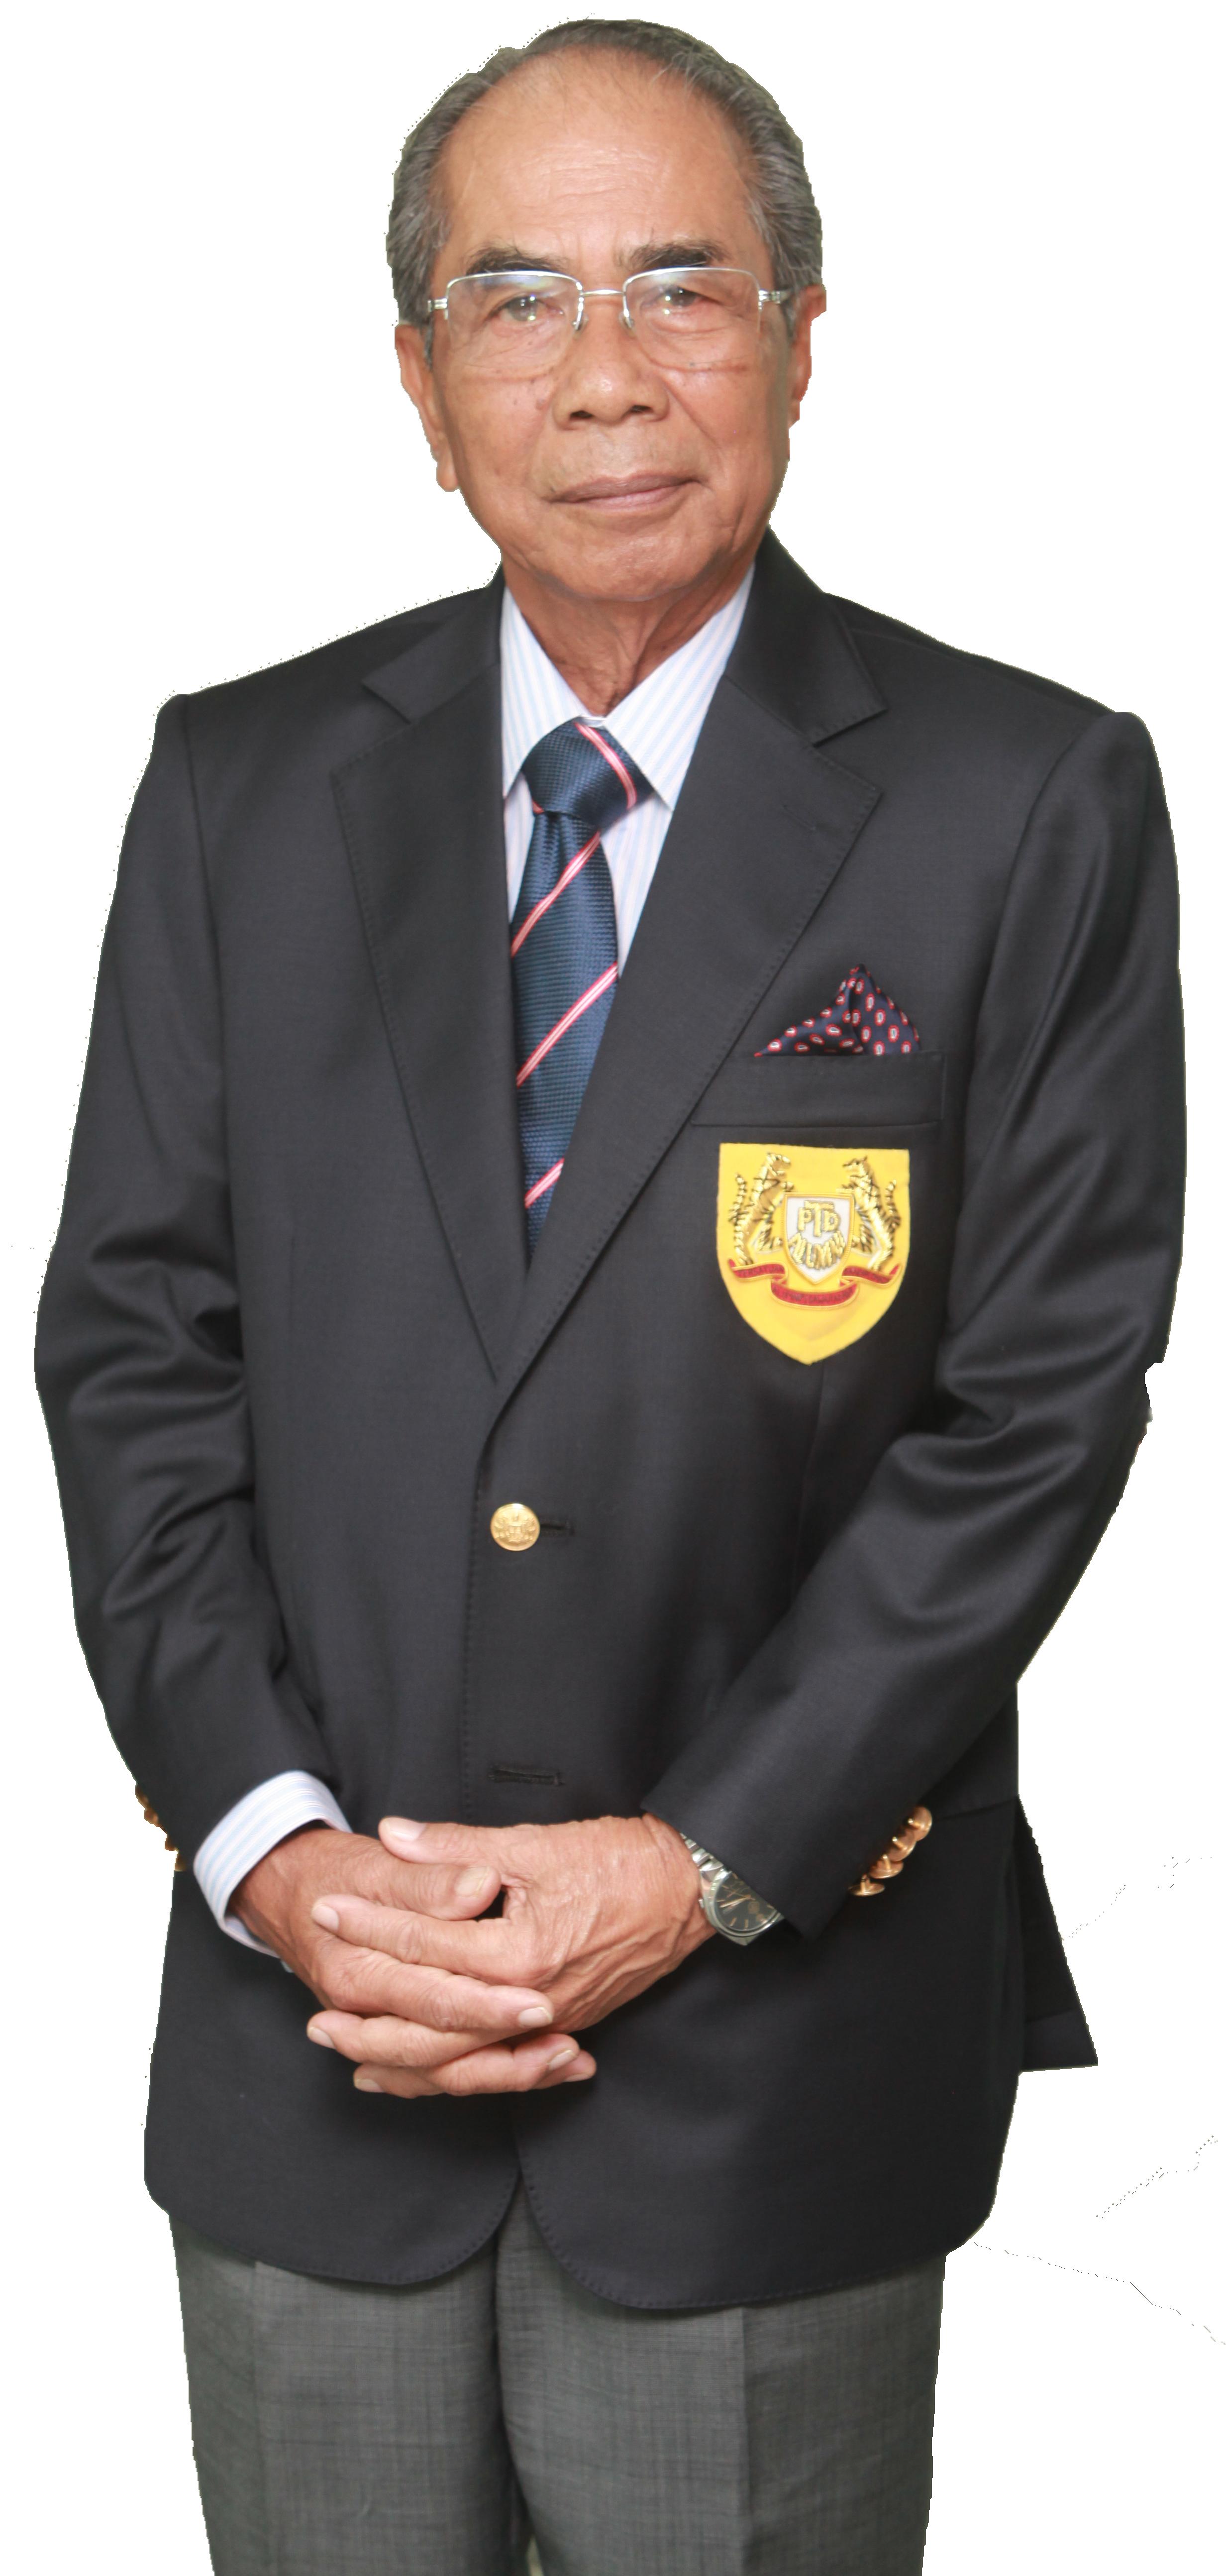 TS Sallehuddin